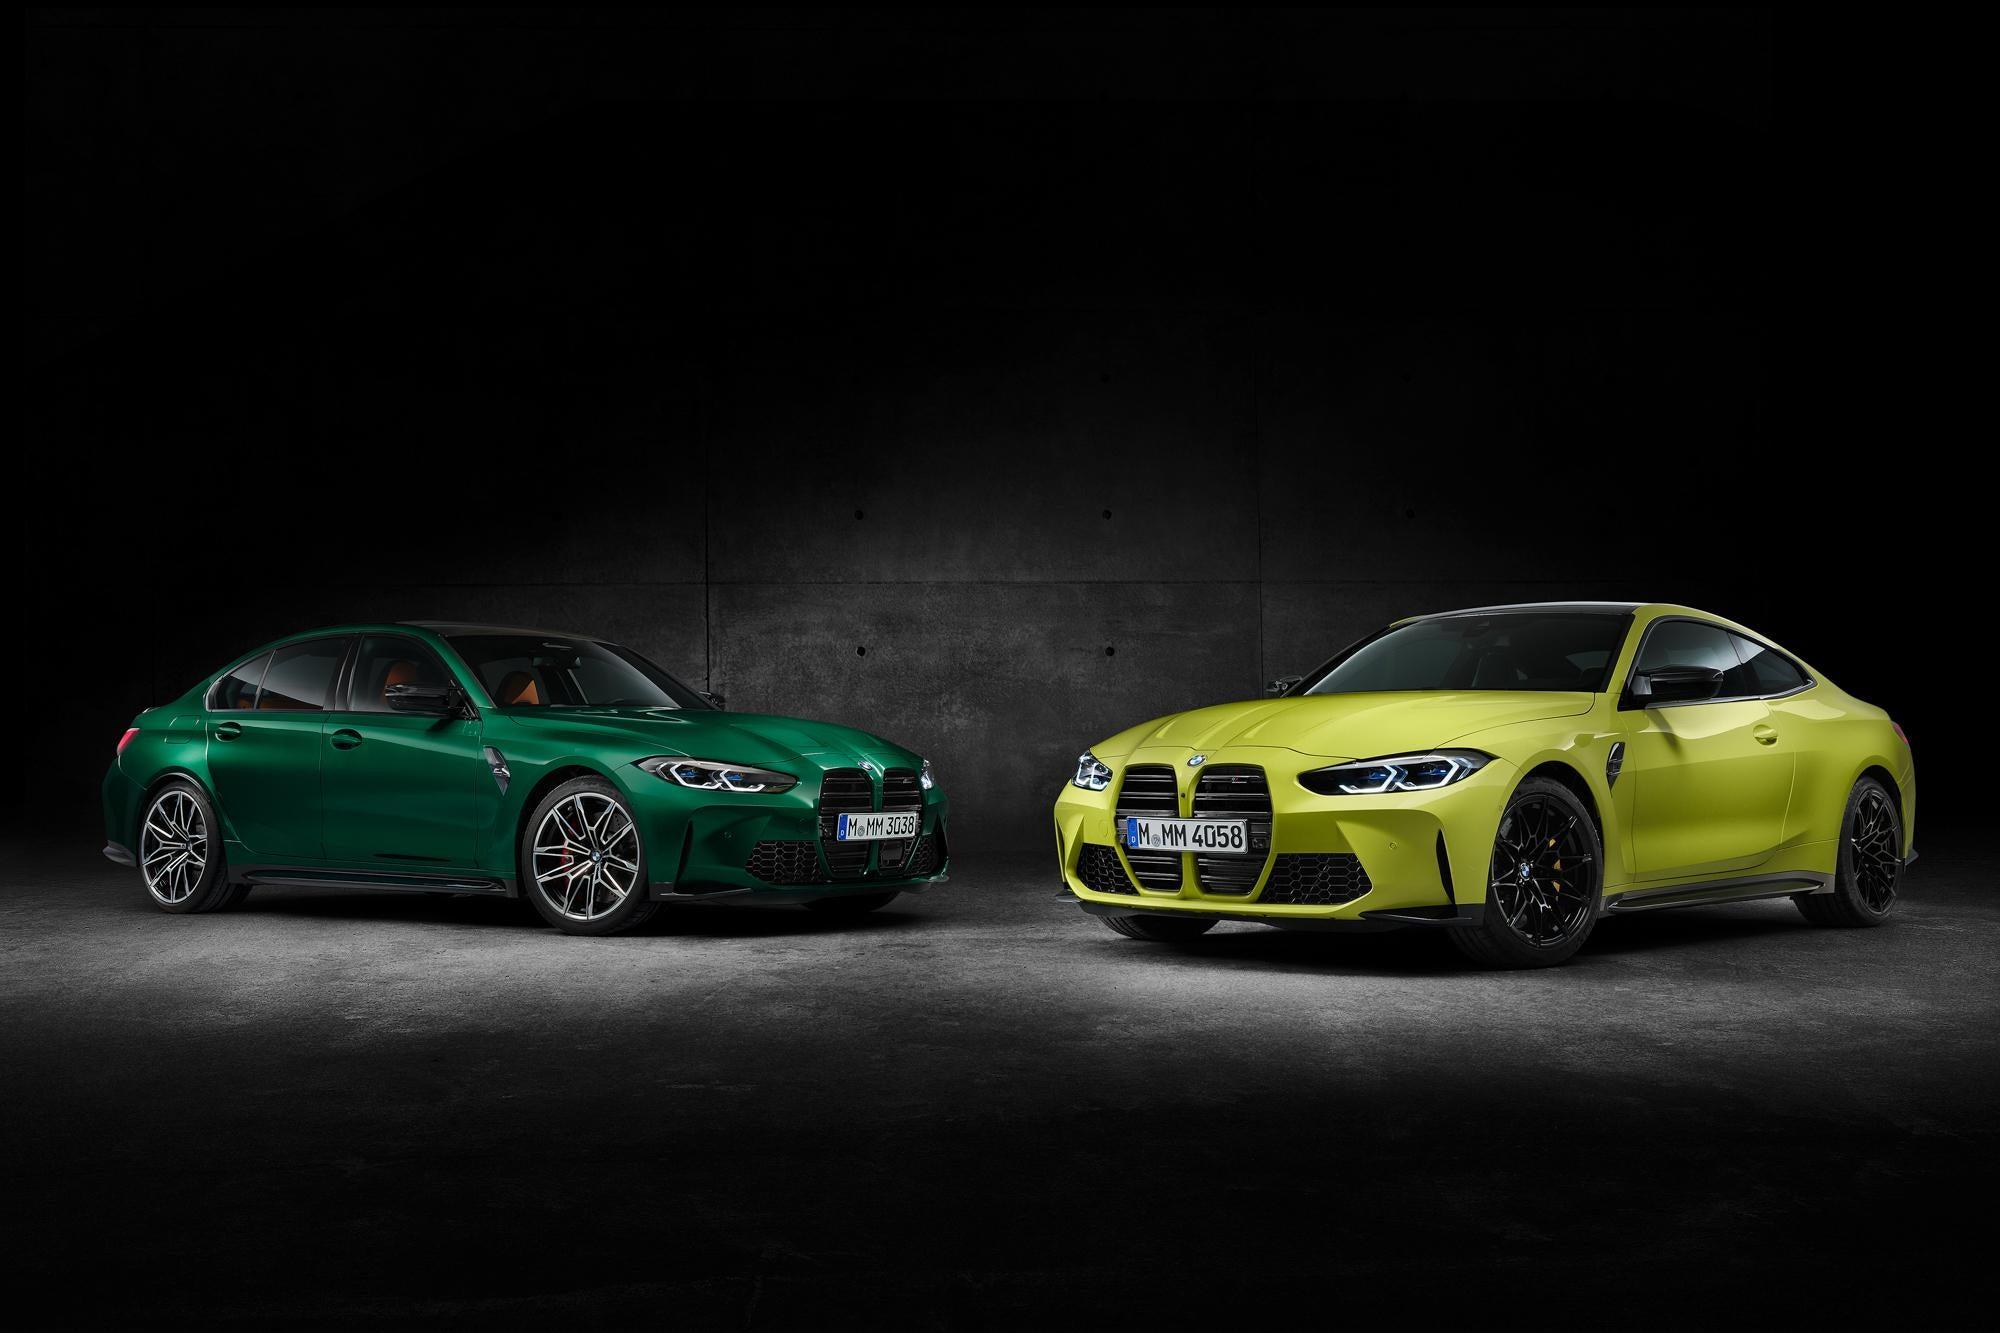 Fotky nového BMW M3 a M4 unikli pred premiérou